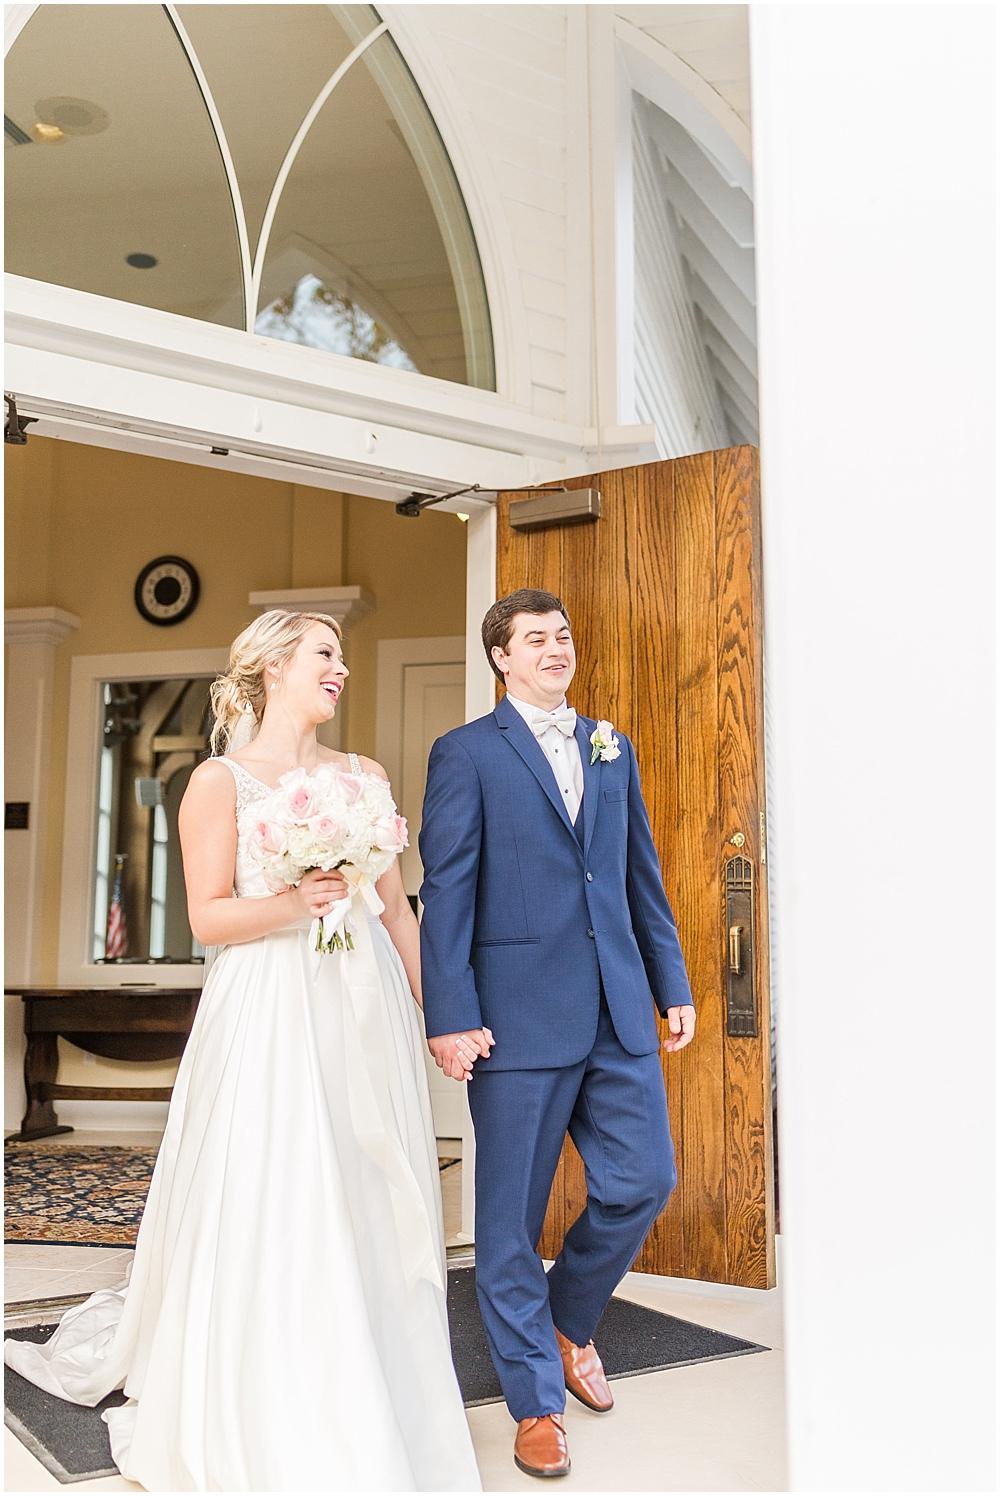 Ashton-Clark-Photography-Wedding-Portrait-Family-Photographer-Mobile-Alabama_0339.jpg